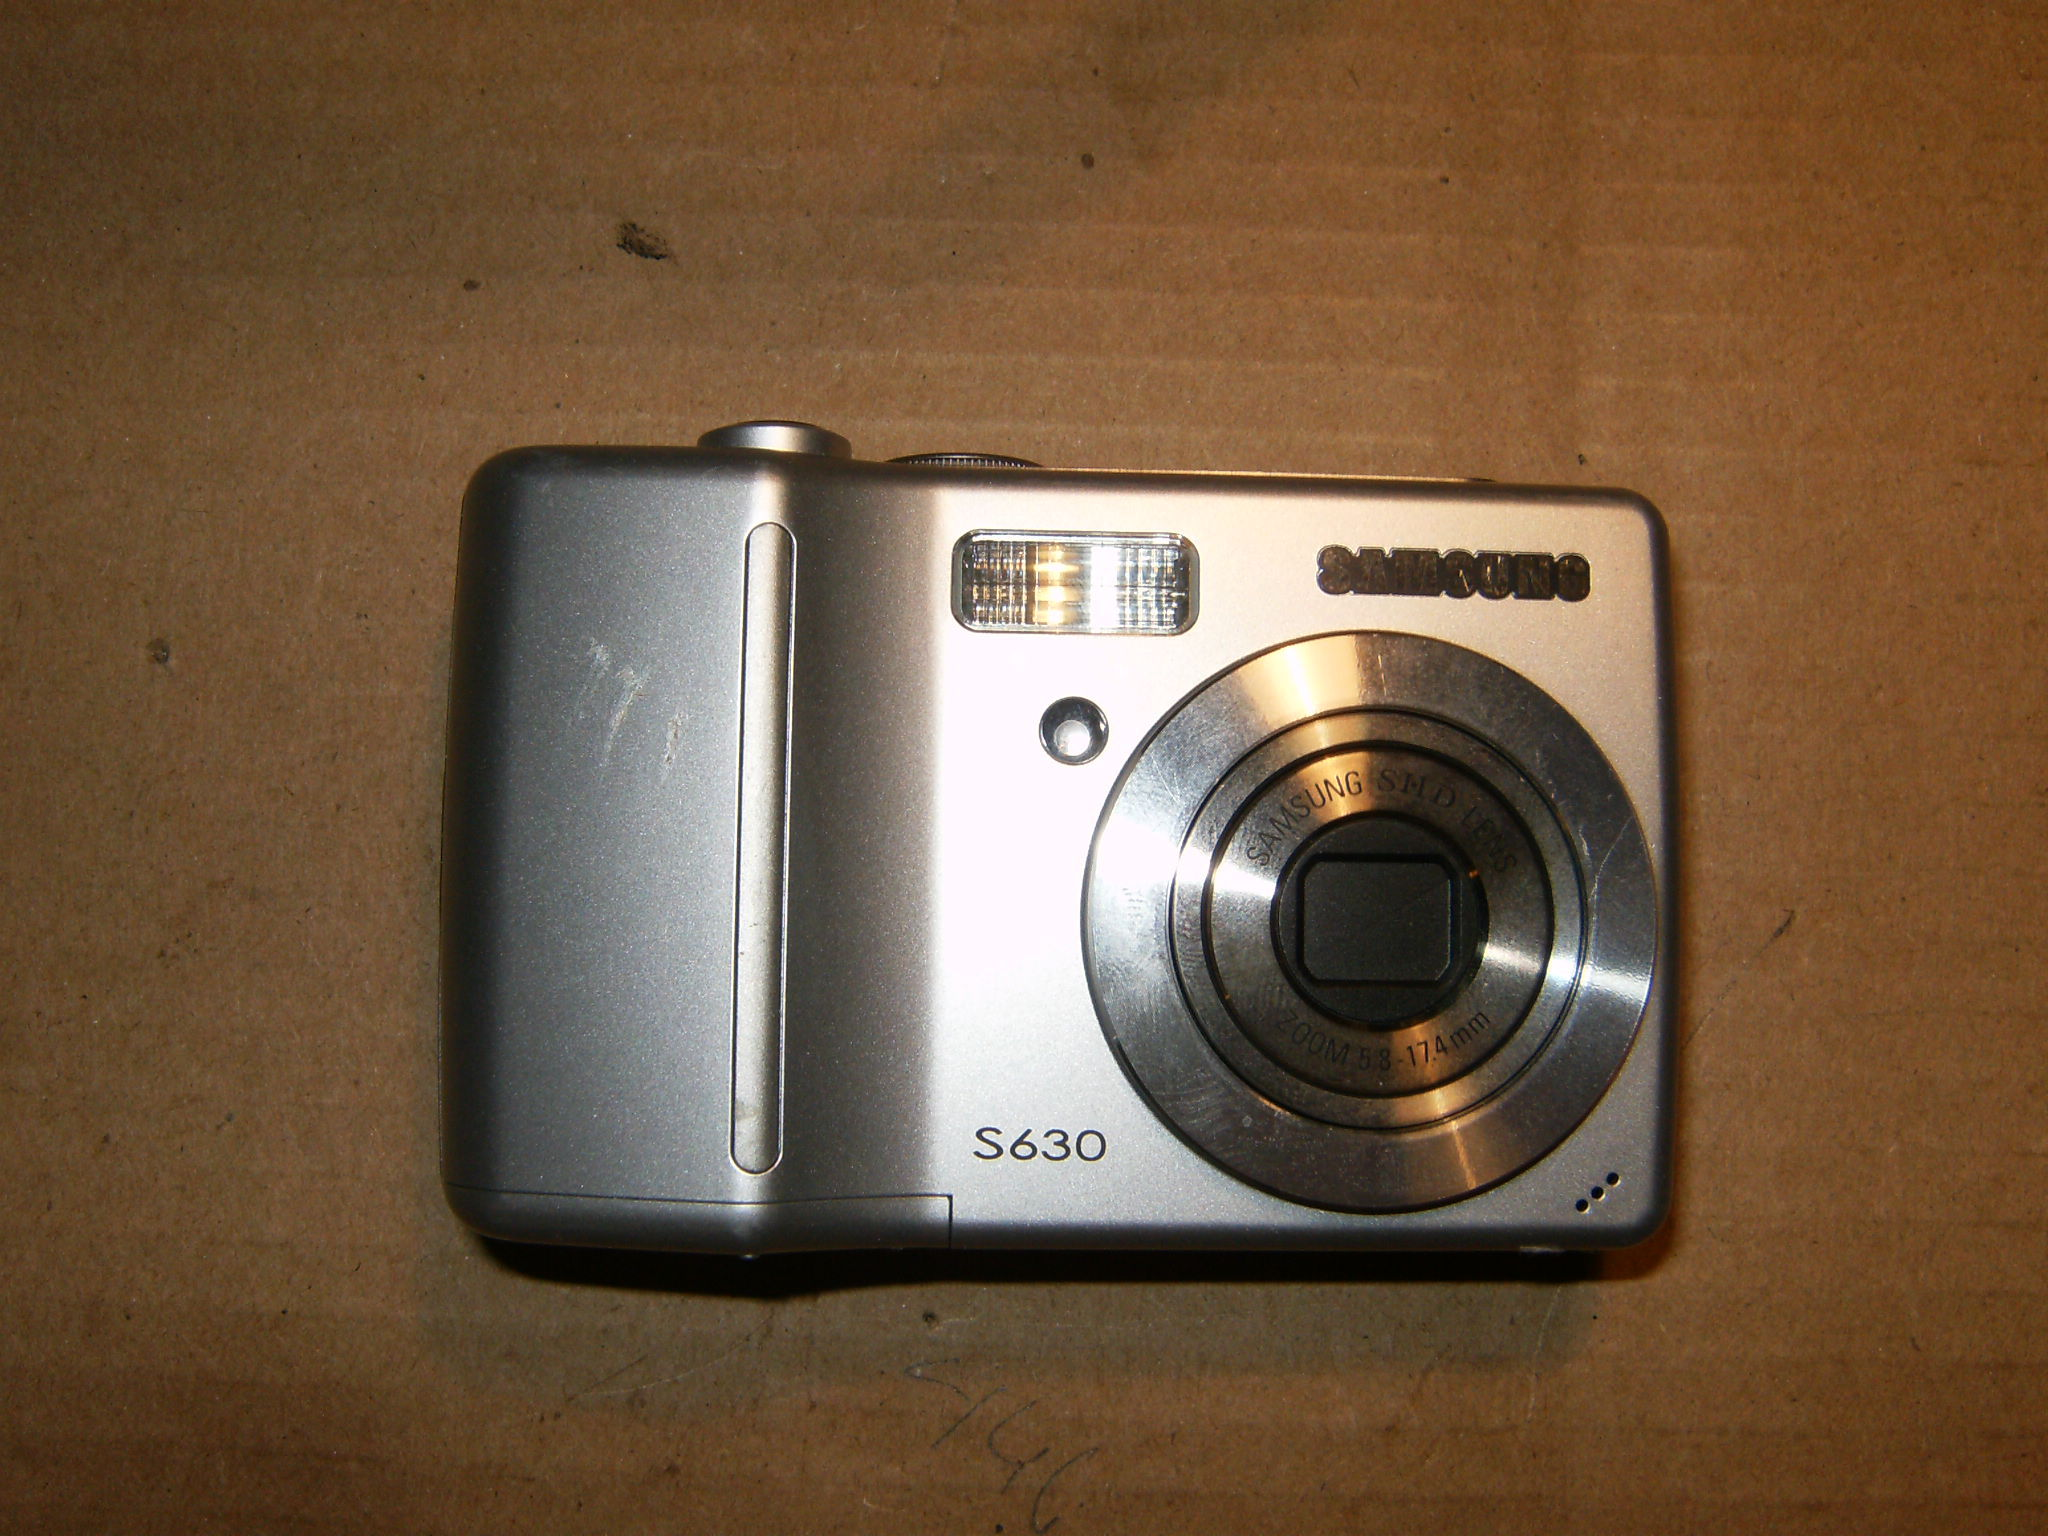 samsung s630 repair ifixit rh ifixit com Samsung S630 Review Samsung S830